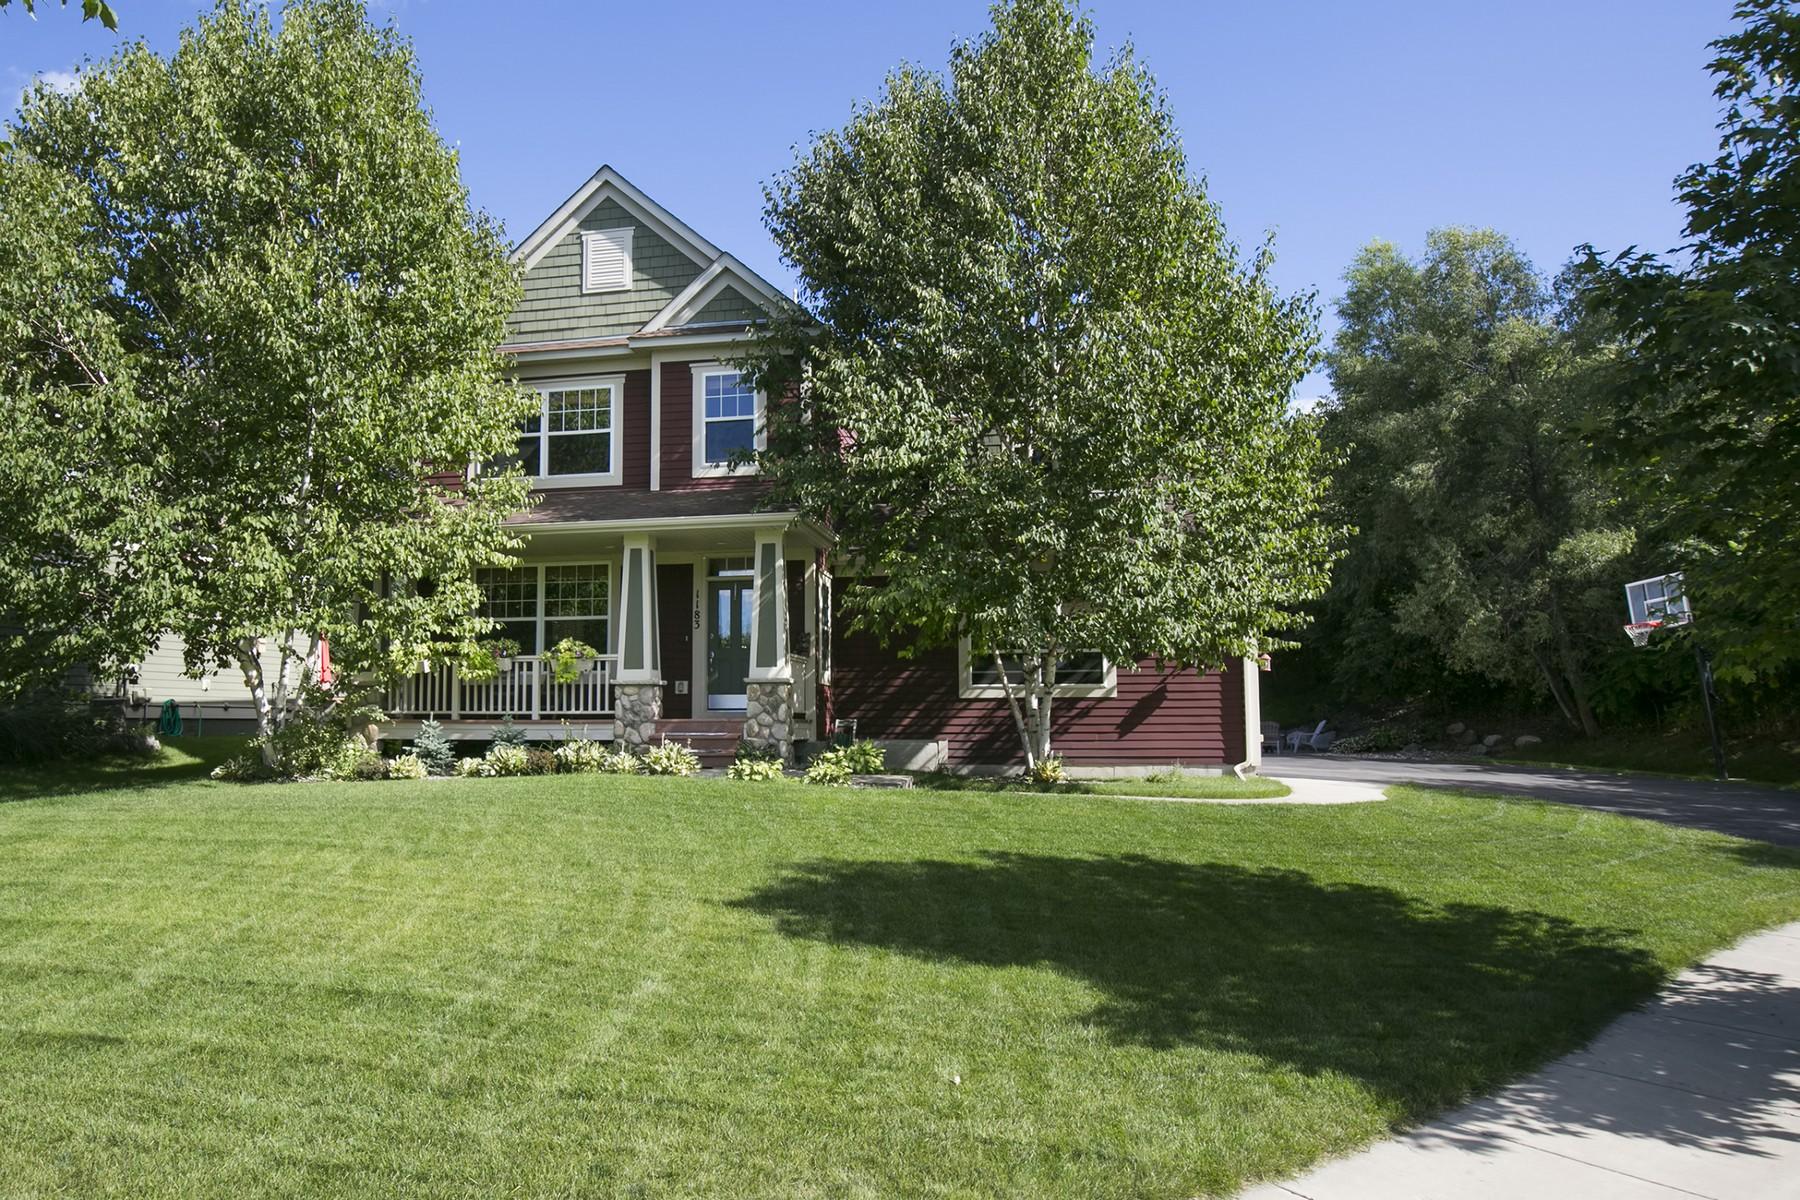 Single Family Home for Sale at 1183 Savanna Trail Victoria, Minnesota 55386 United States